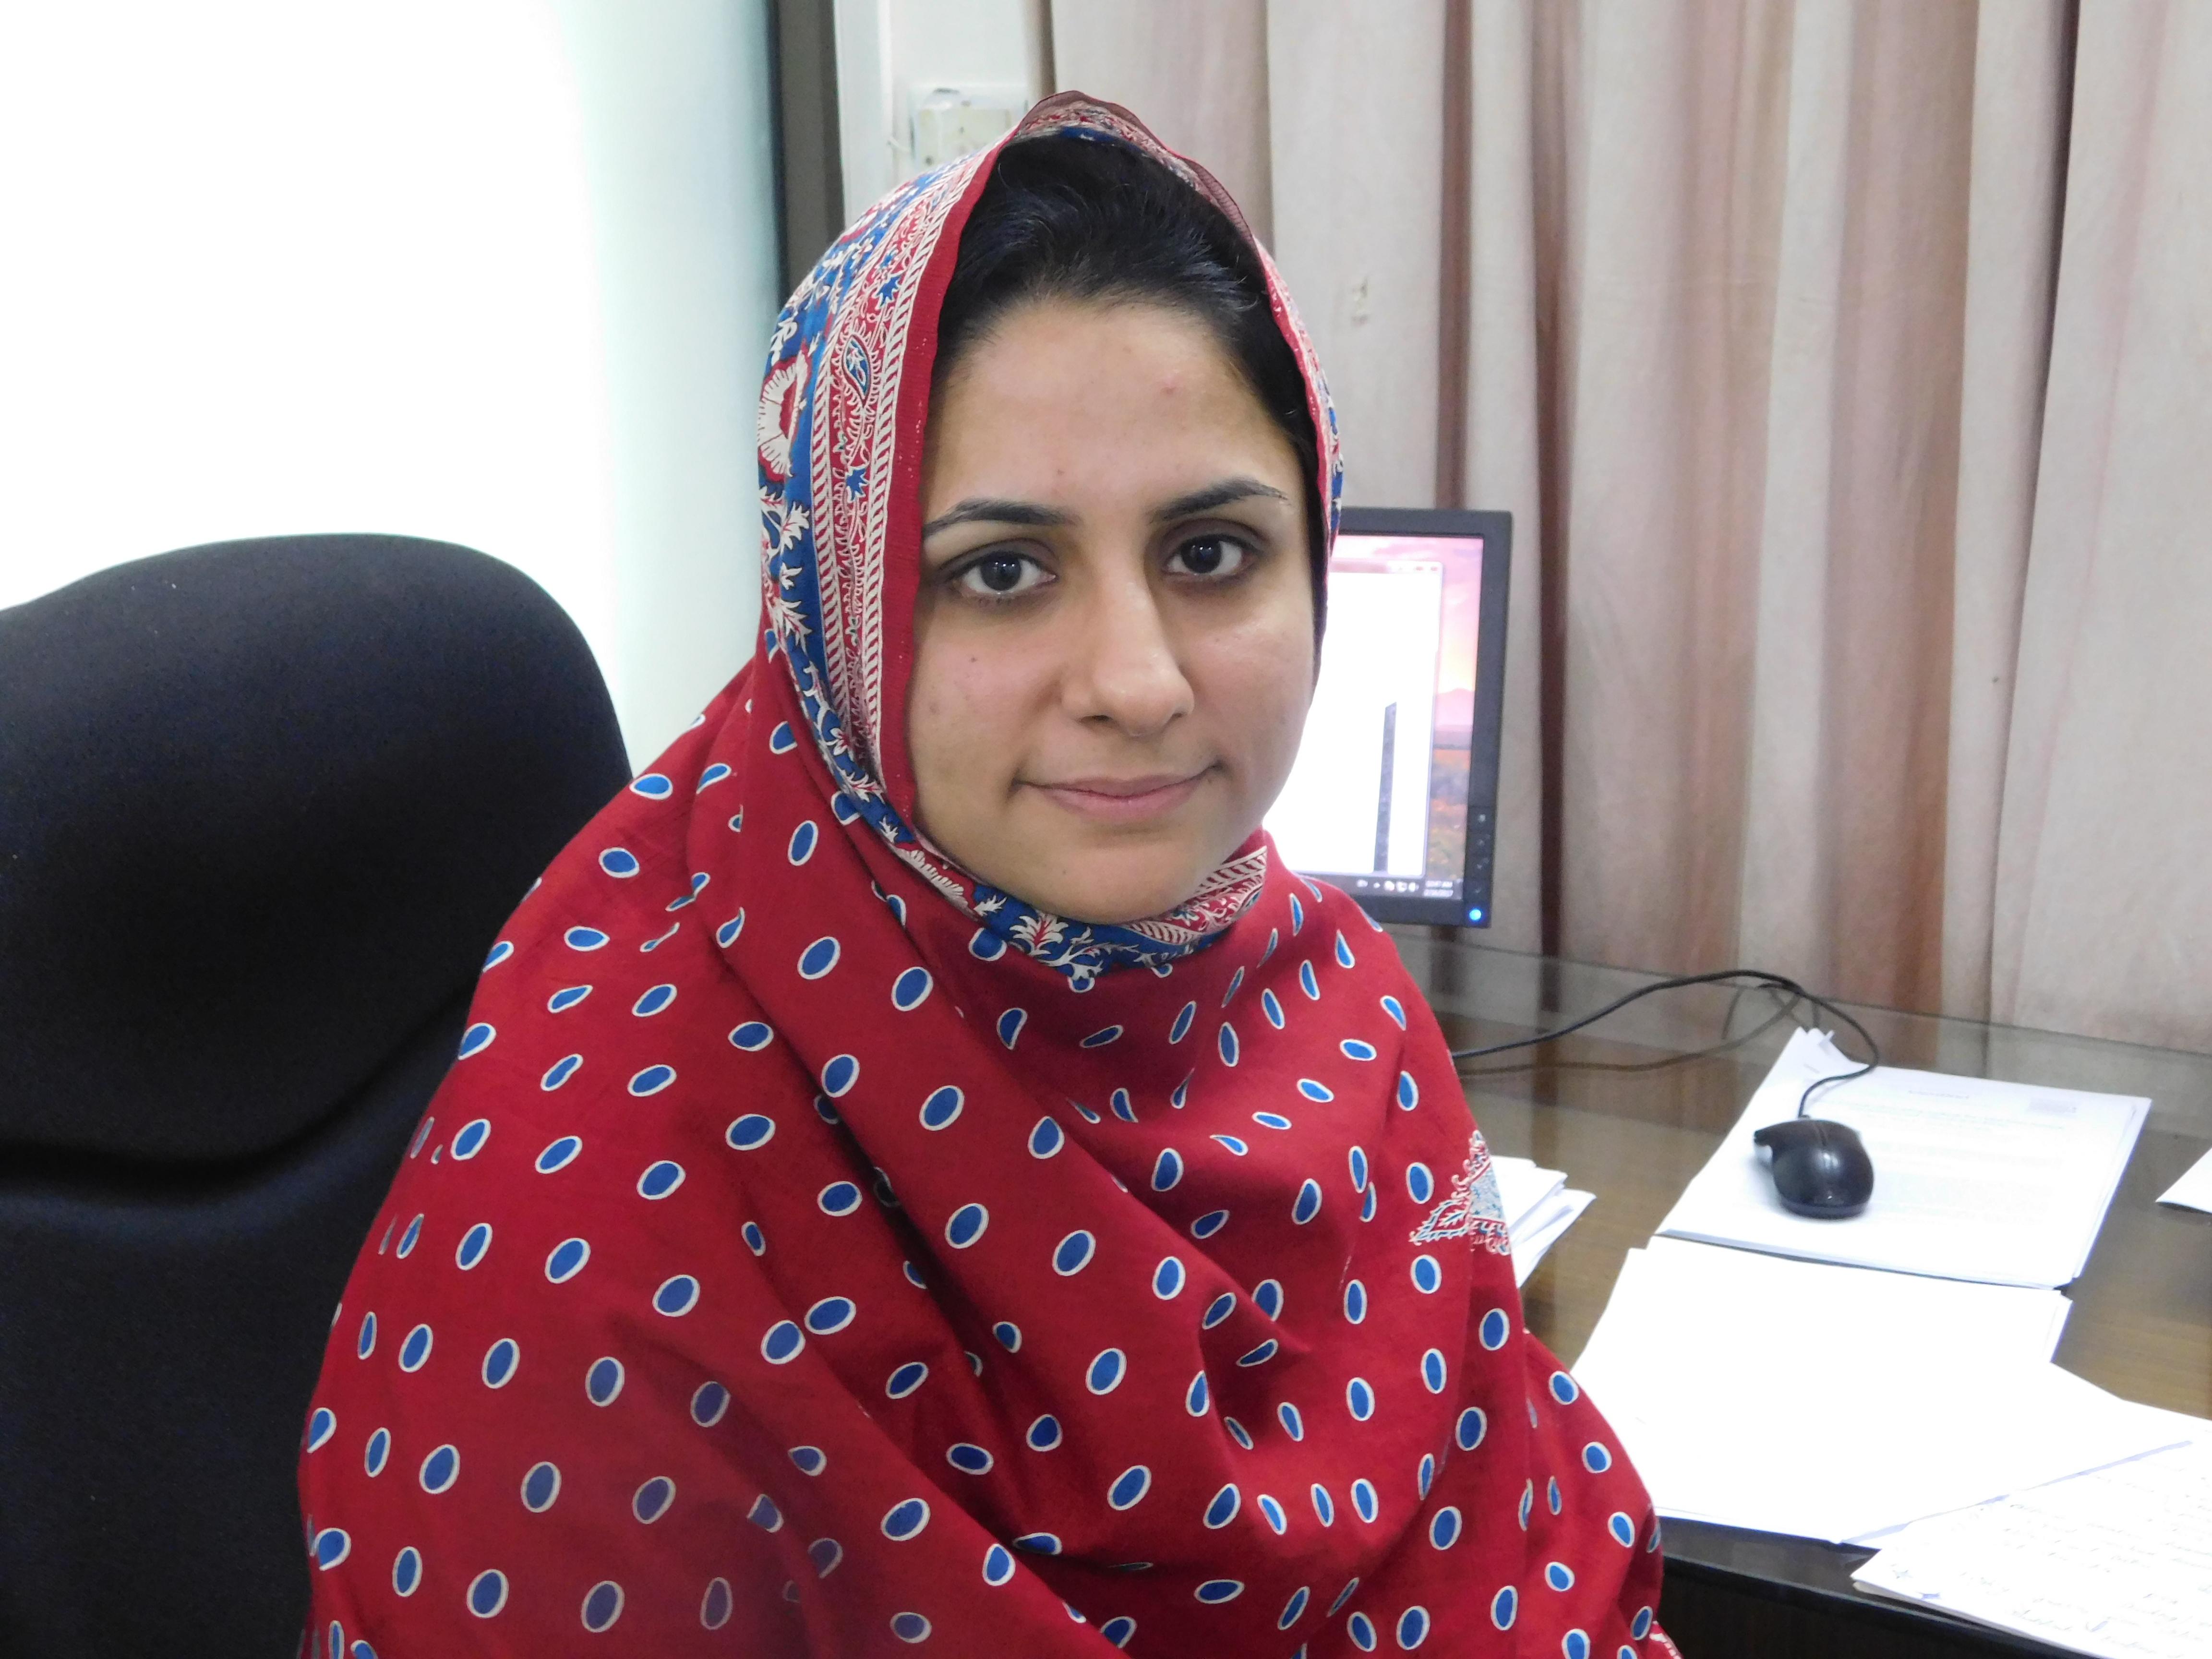 Laila Naqvi